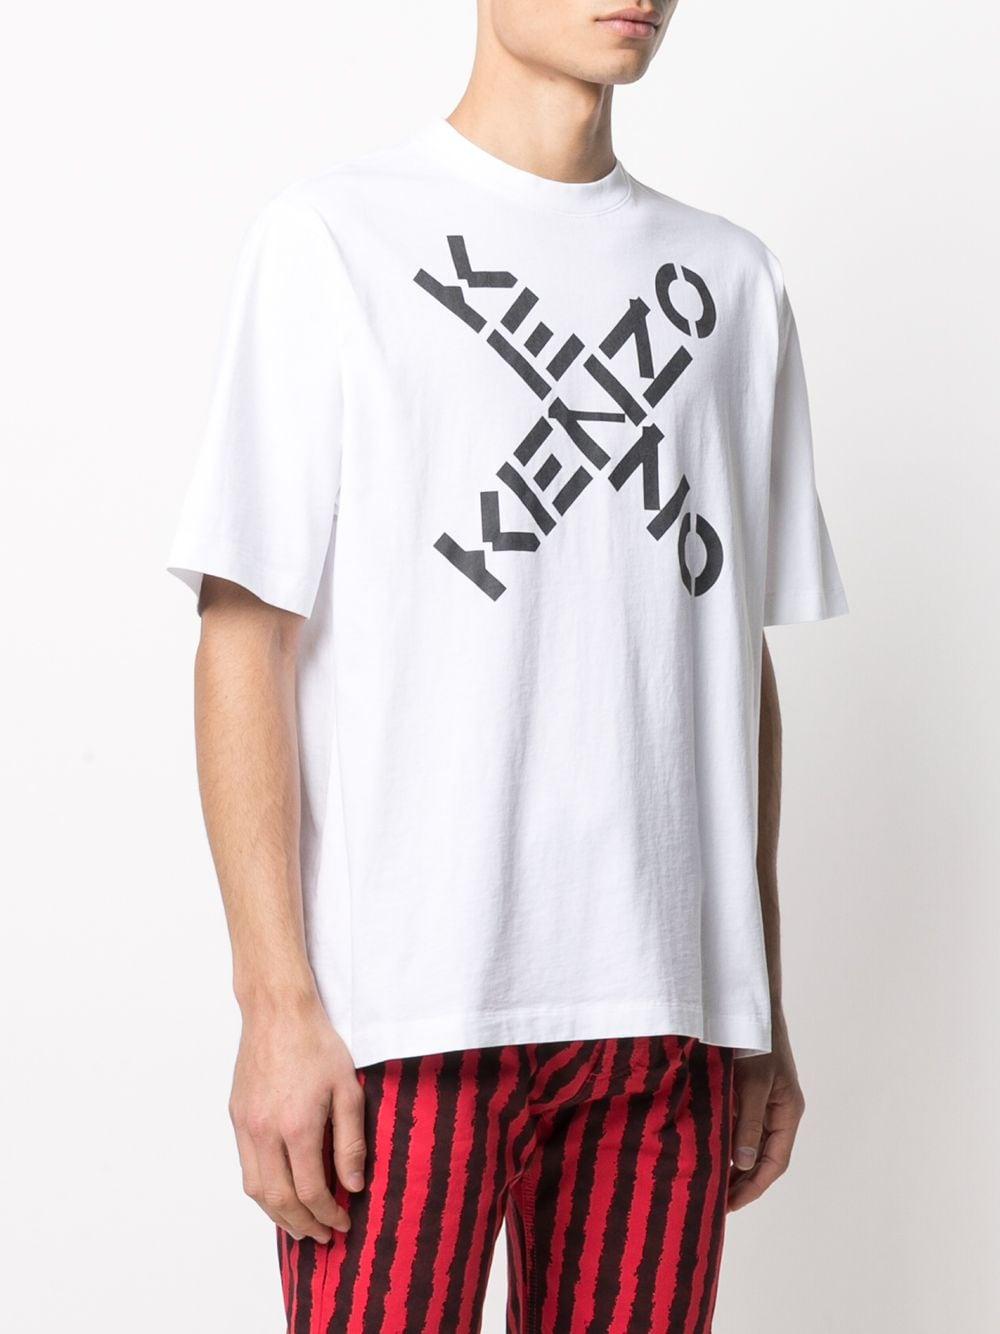 Kenzo t-shirt con logo uomo KENZO | T-shirt | FA65TS5024SJ01